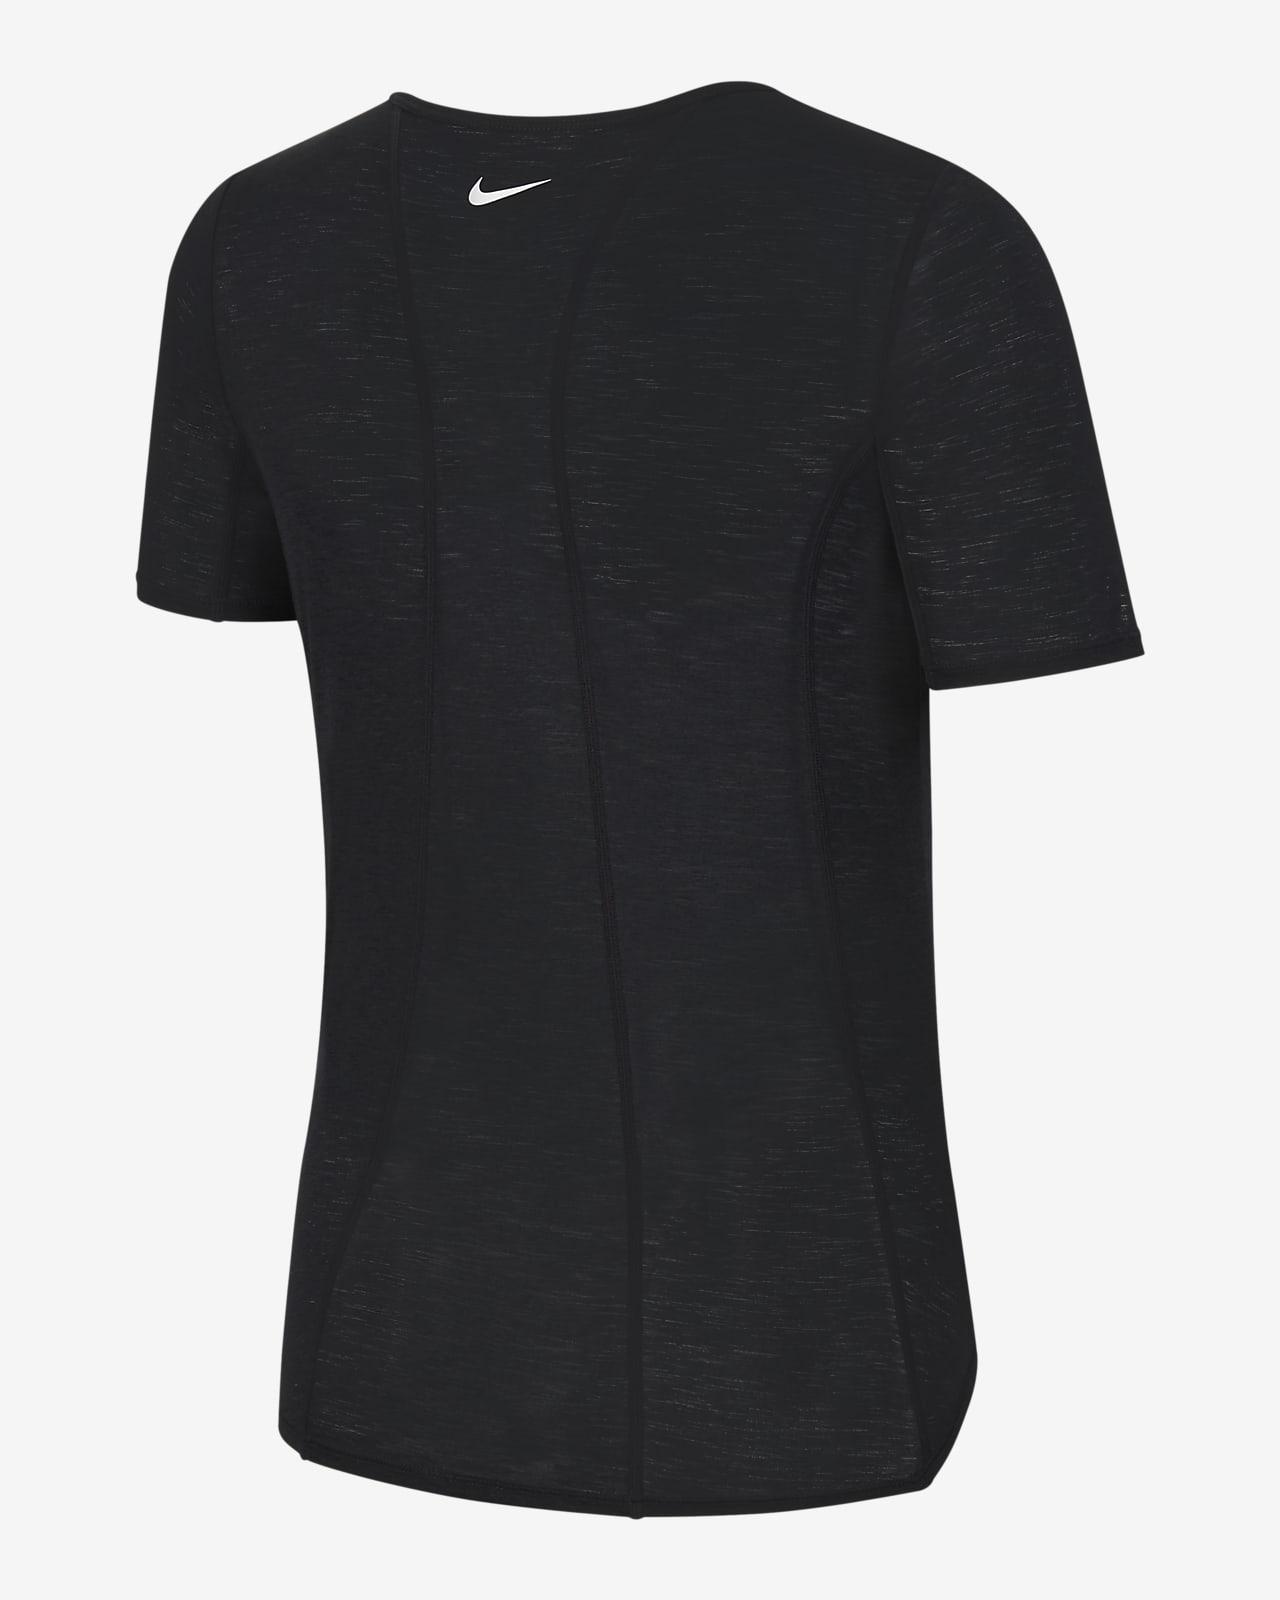 Short-Sleeve Running Top. Nike SG